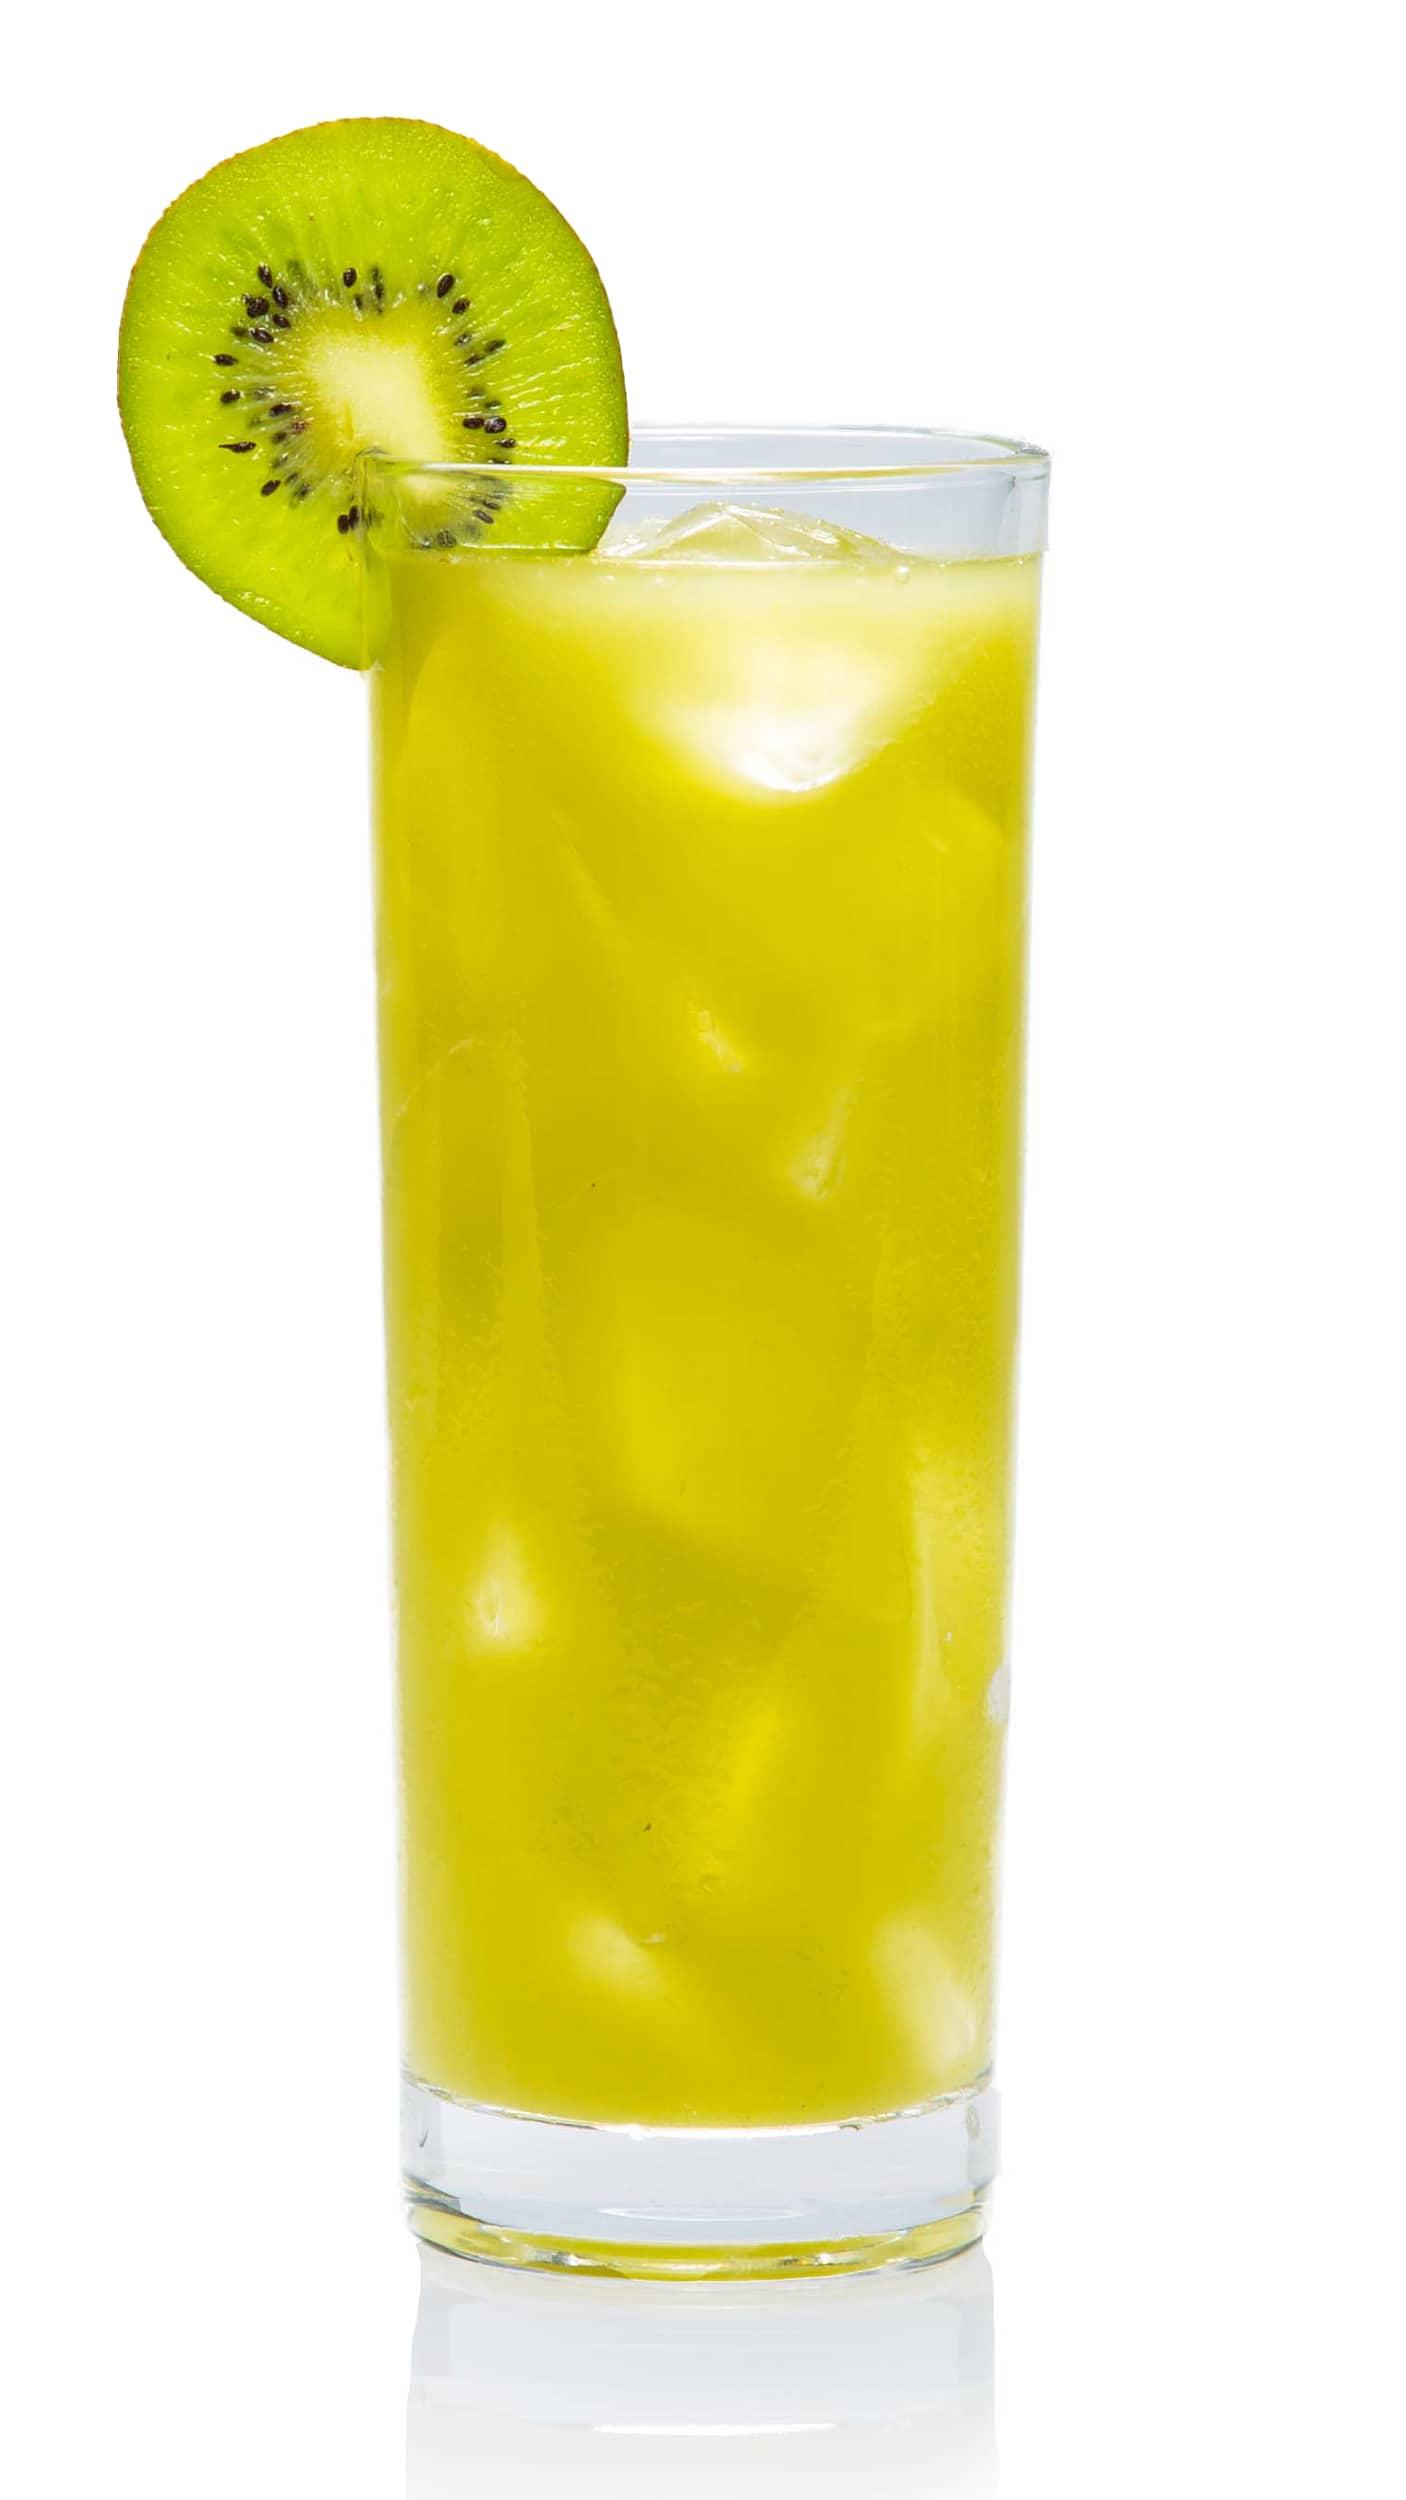 Kiwi sweet sour drink with EFFEN Cucumber Vodka, maraschino liqueur, kiwi and fresh lime juice.